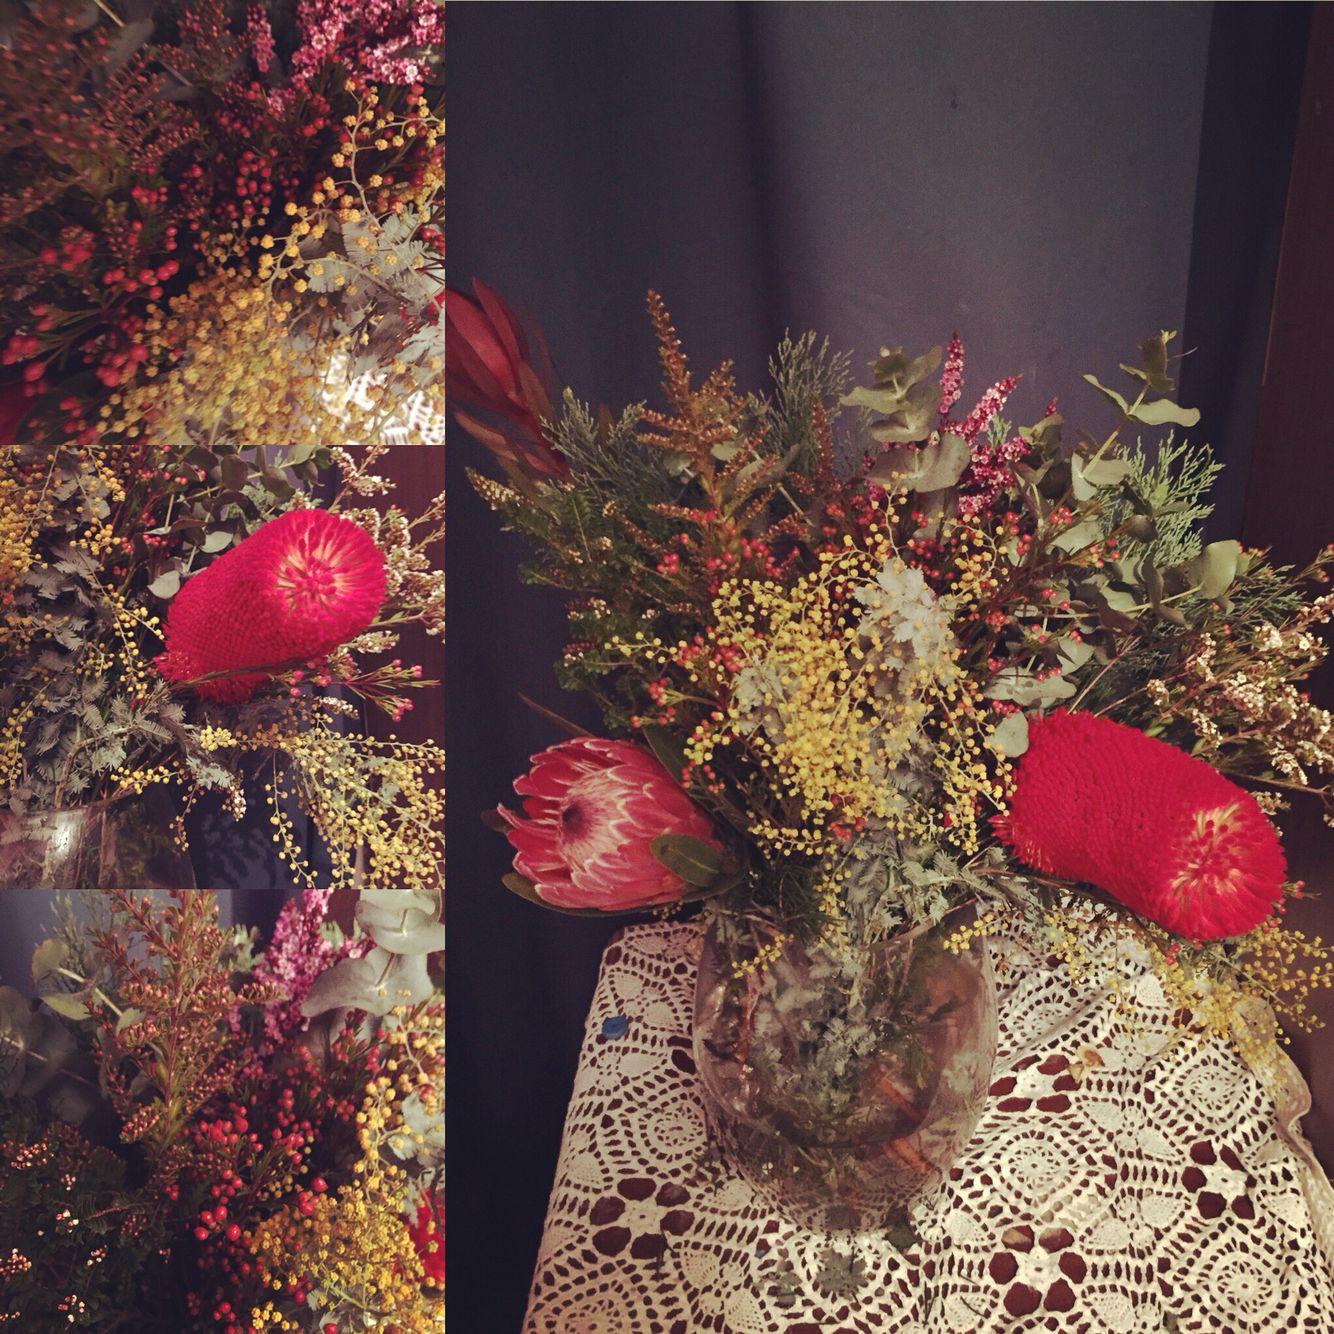 Wildflowers I brought yesterday (6/7/2015).